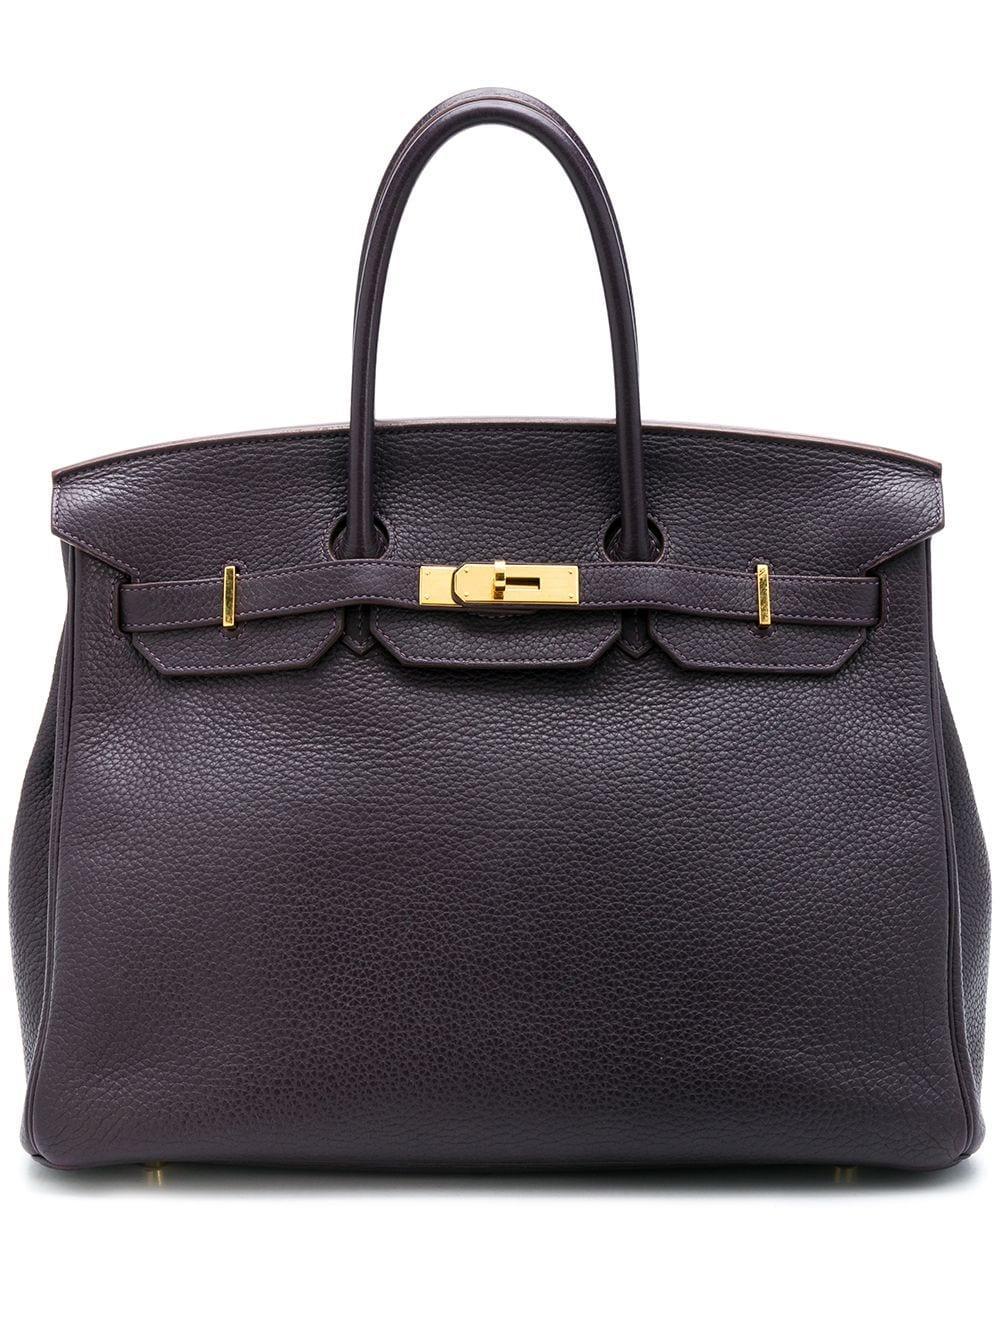 HermÈs Raisin Clemence 35cm Birkin Bag